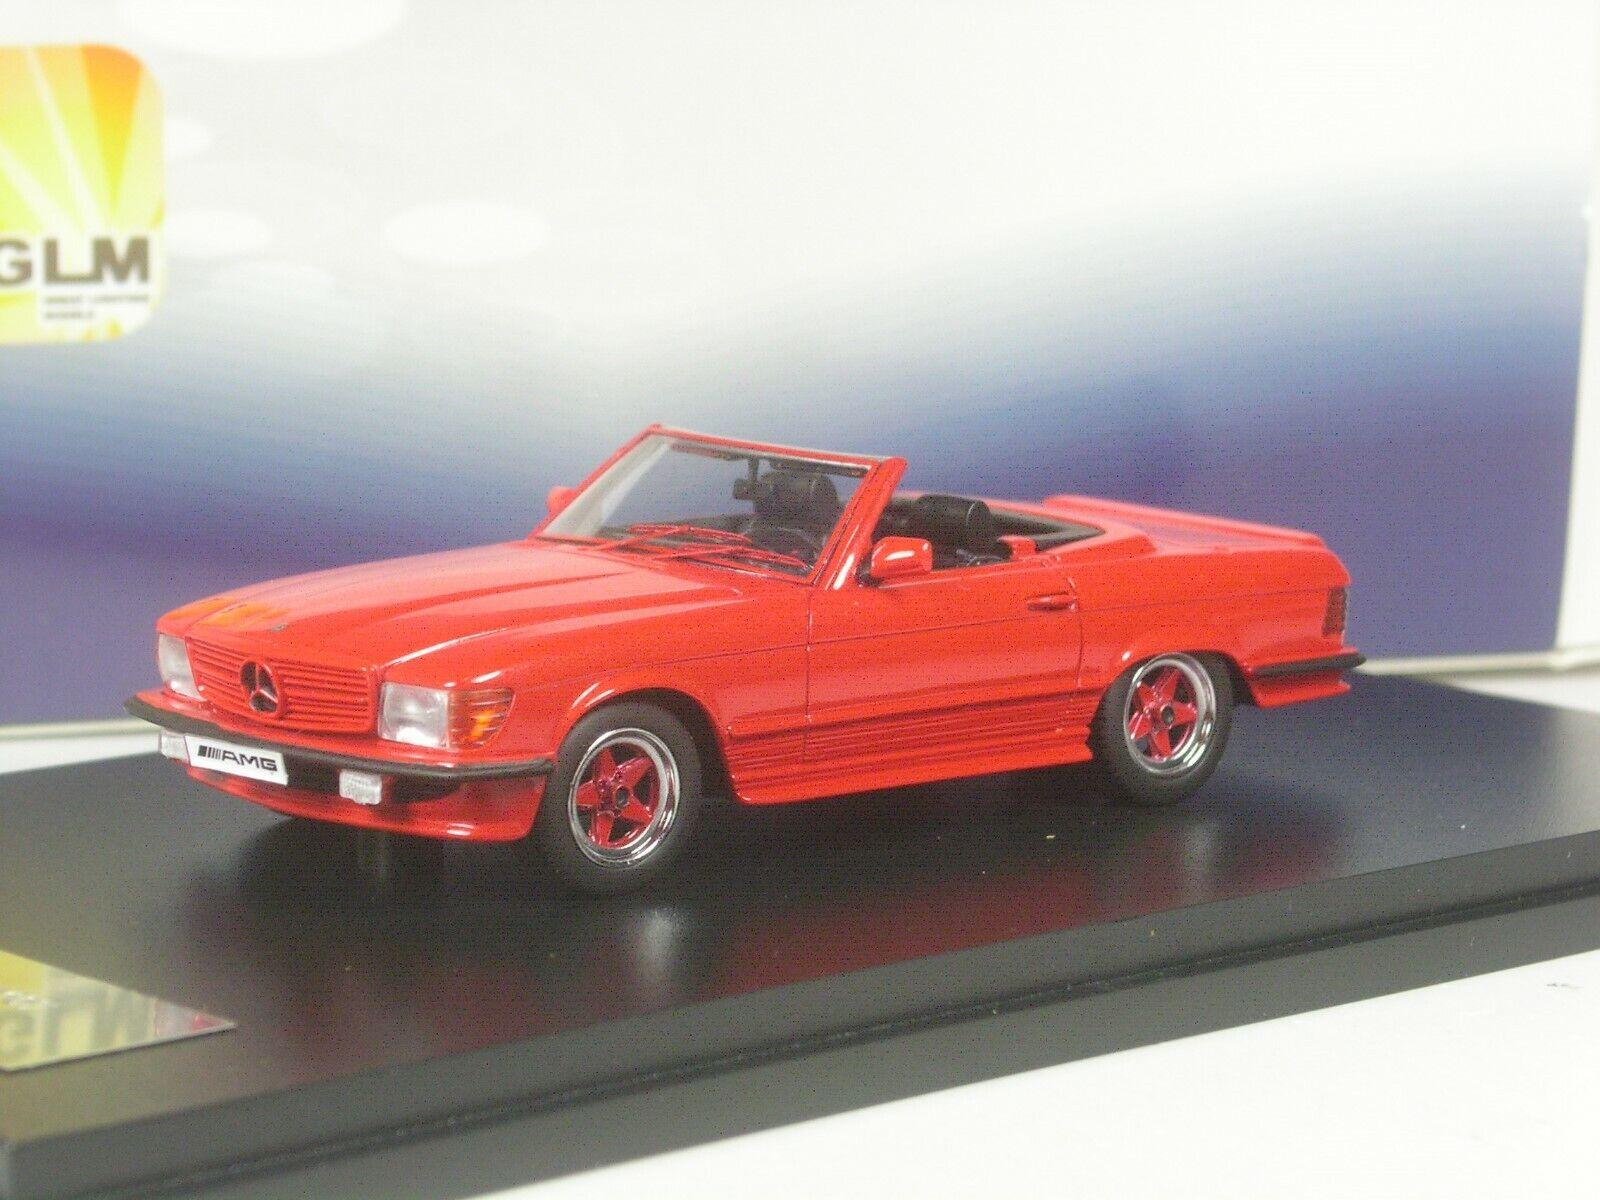 (KI-08-19) GLM Mercedes-Benz 500 SL AMG R107 rot 1 43 in OVP    Zu verkaufen